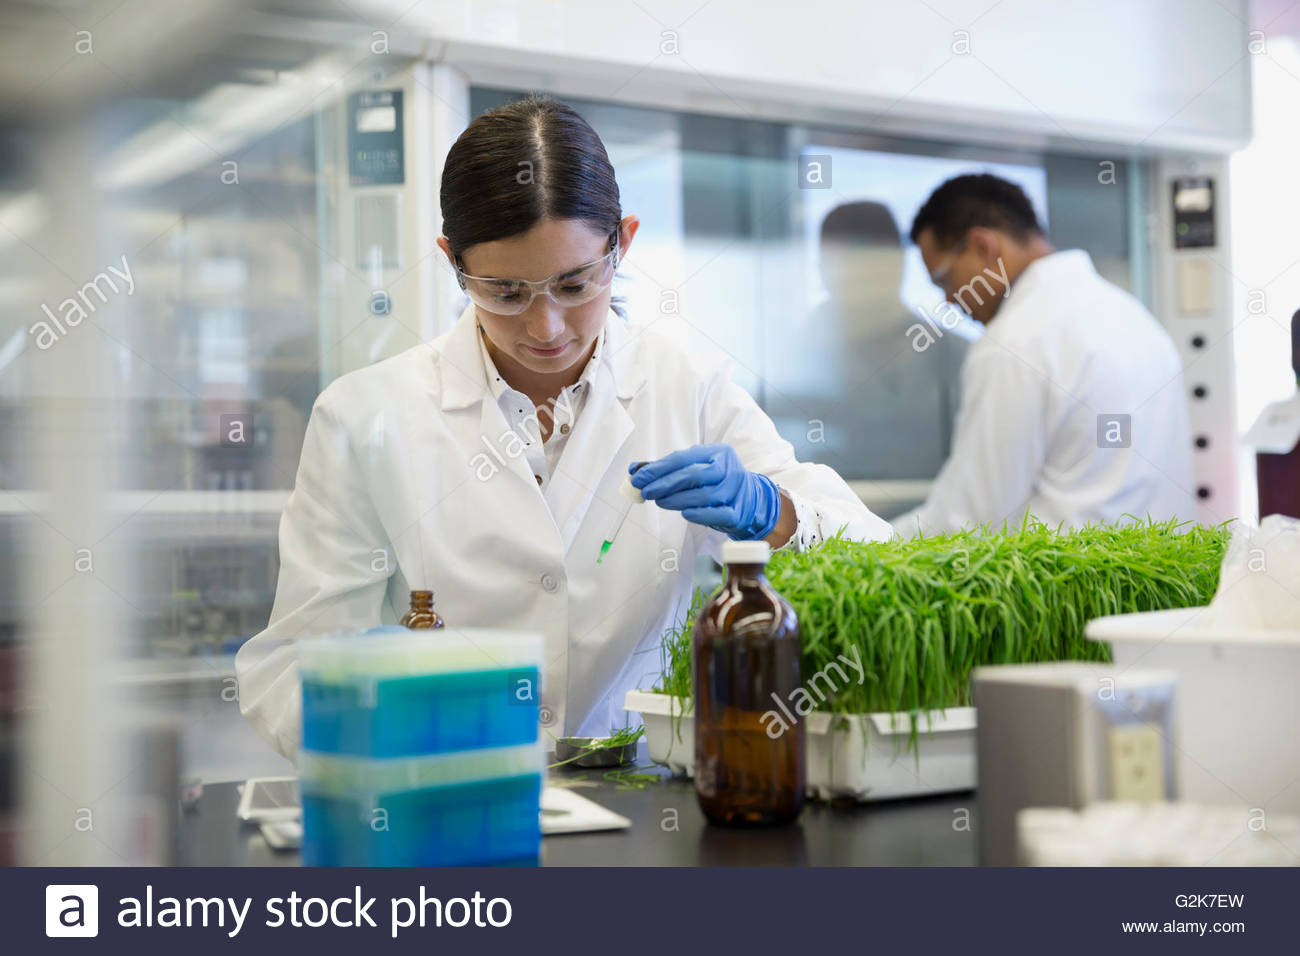 Scientist conducting GMO plant experiment in laboratory - Stock Image